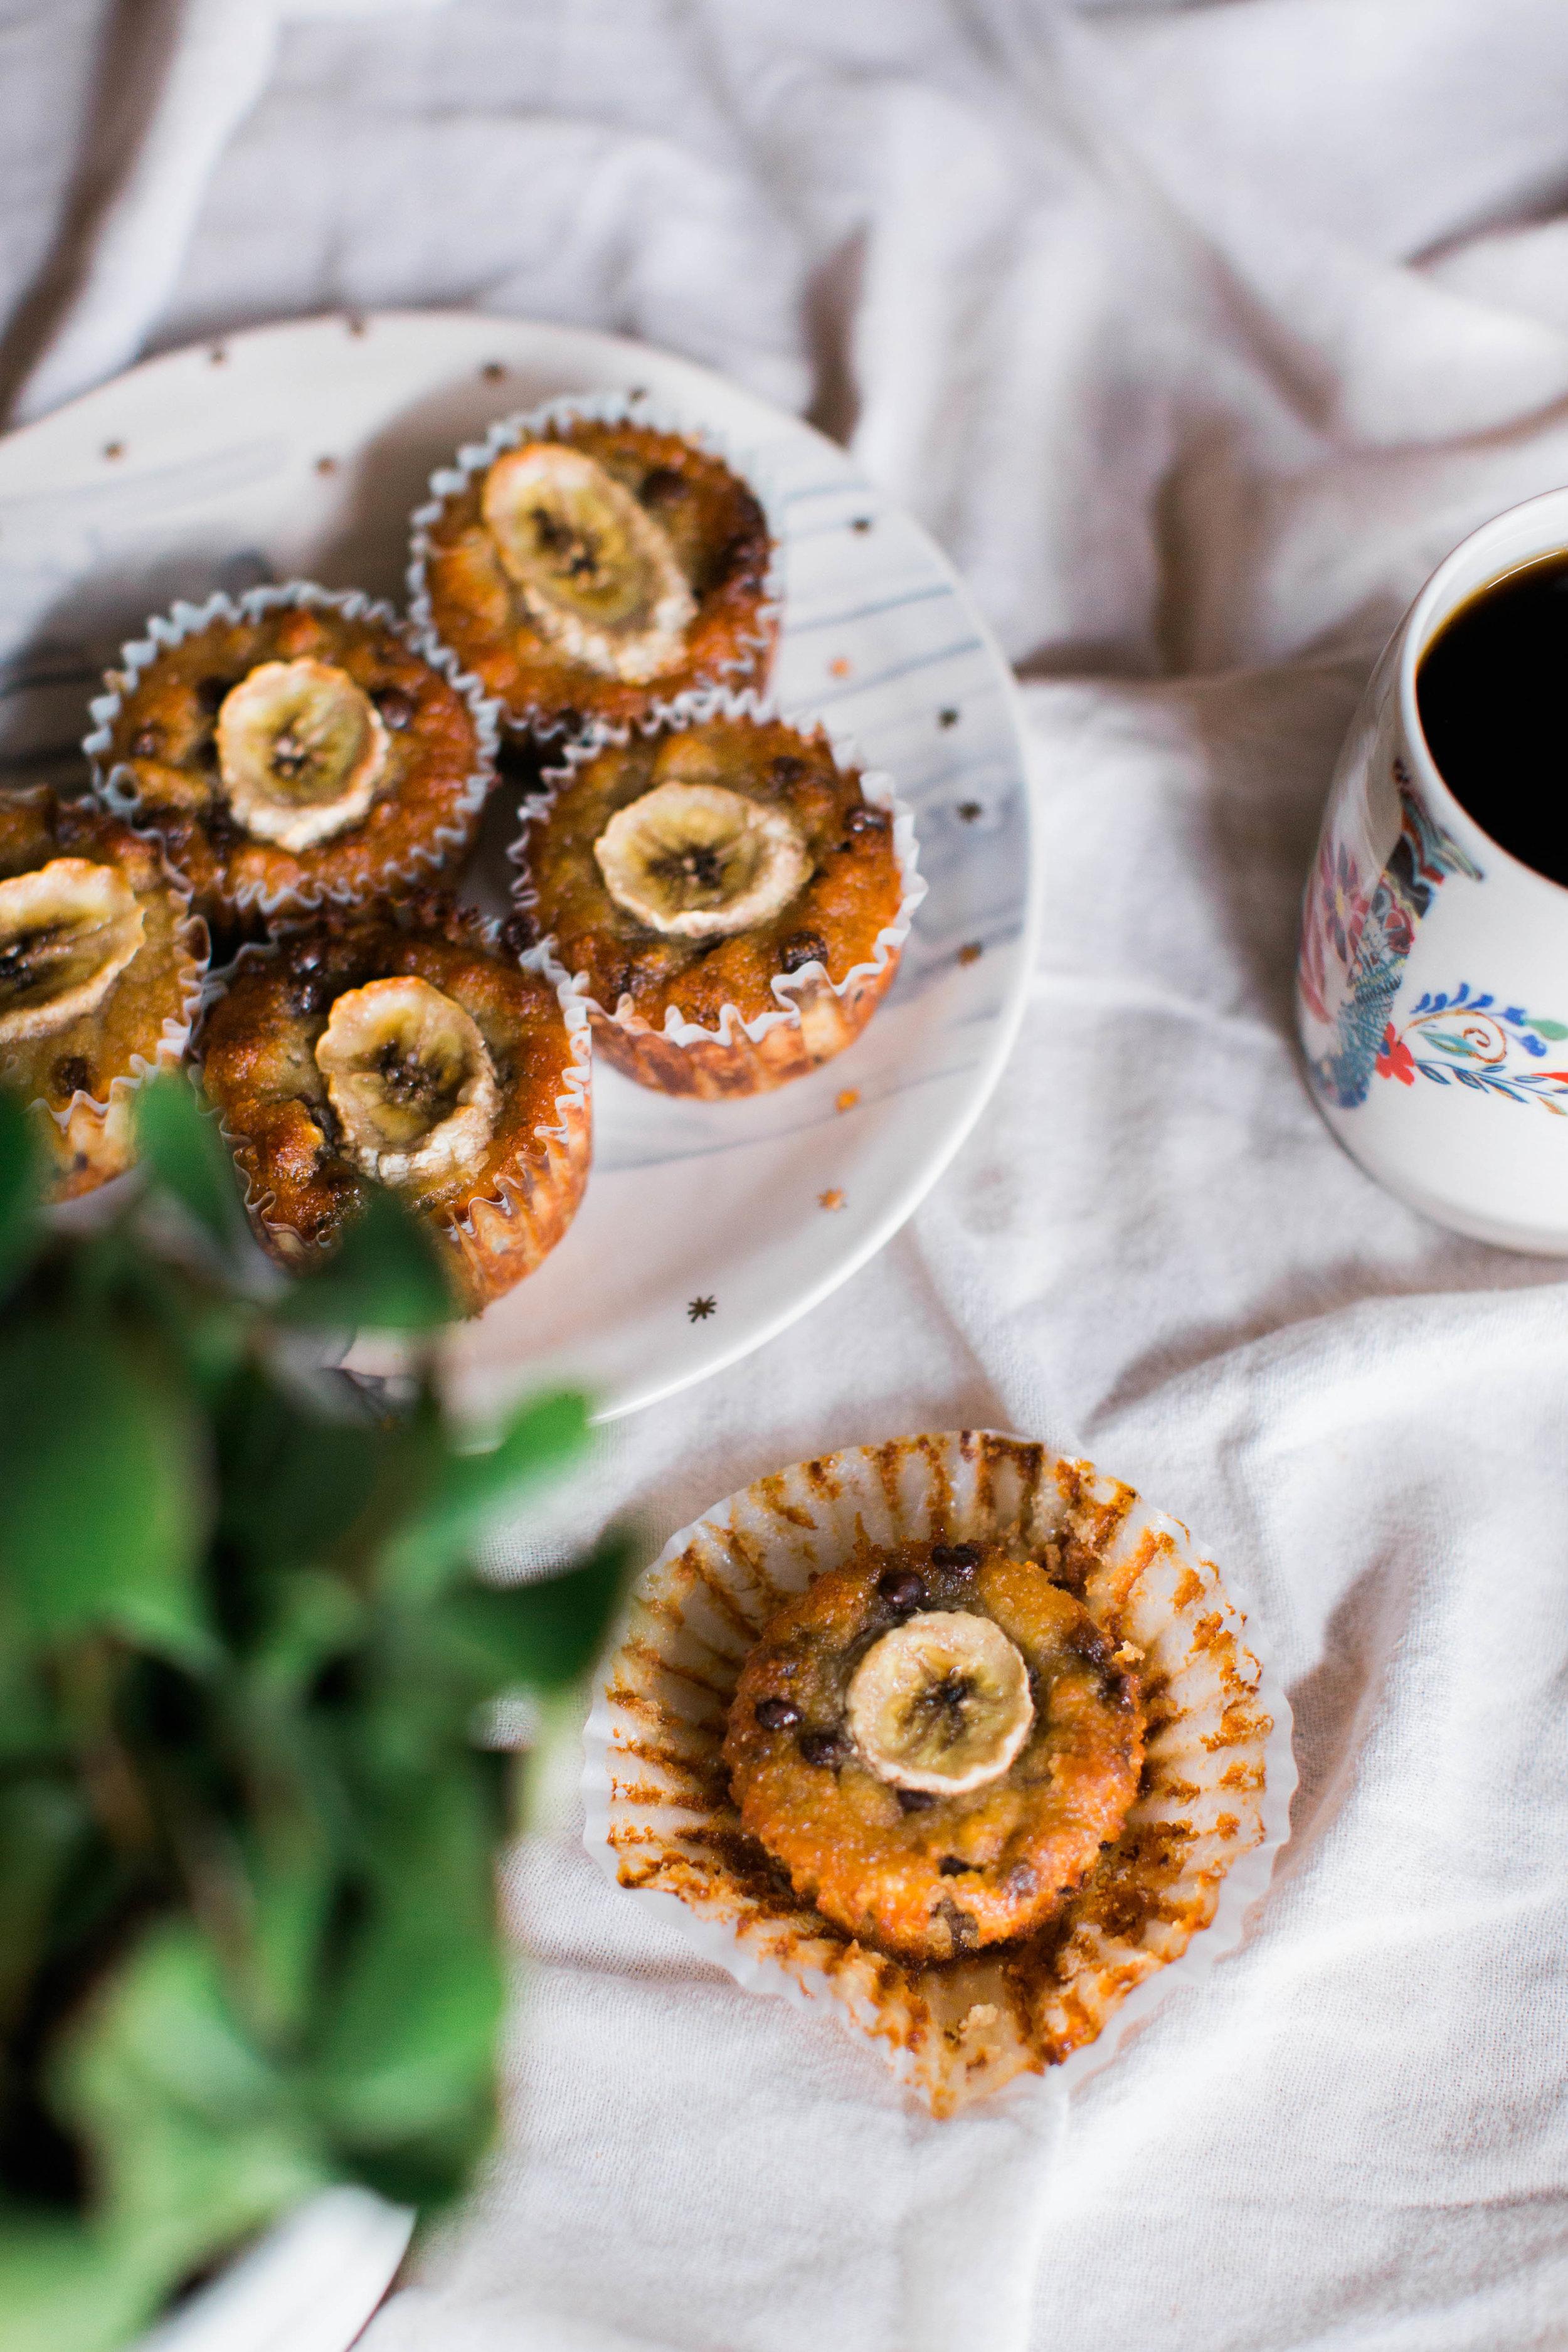 jennahazelphotography-paleo-banana-chocolate-chip-muffins-1145.jpg